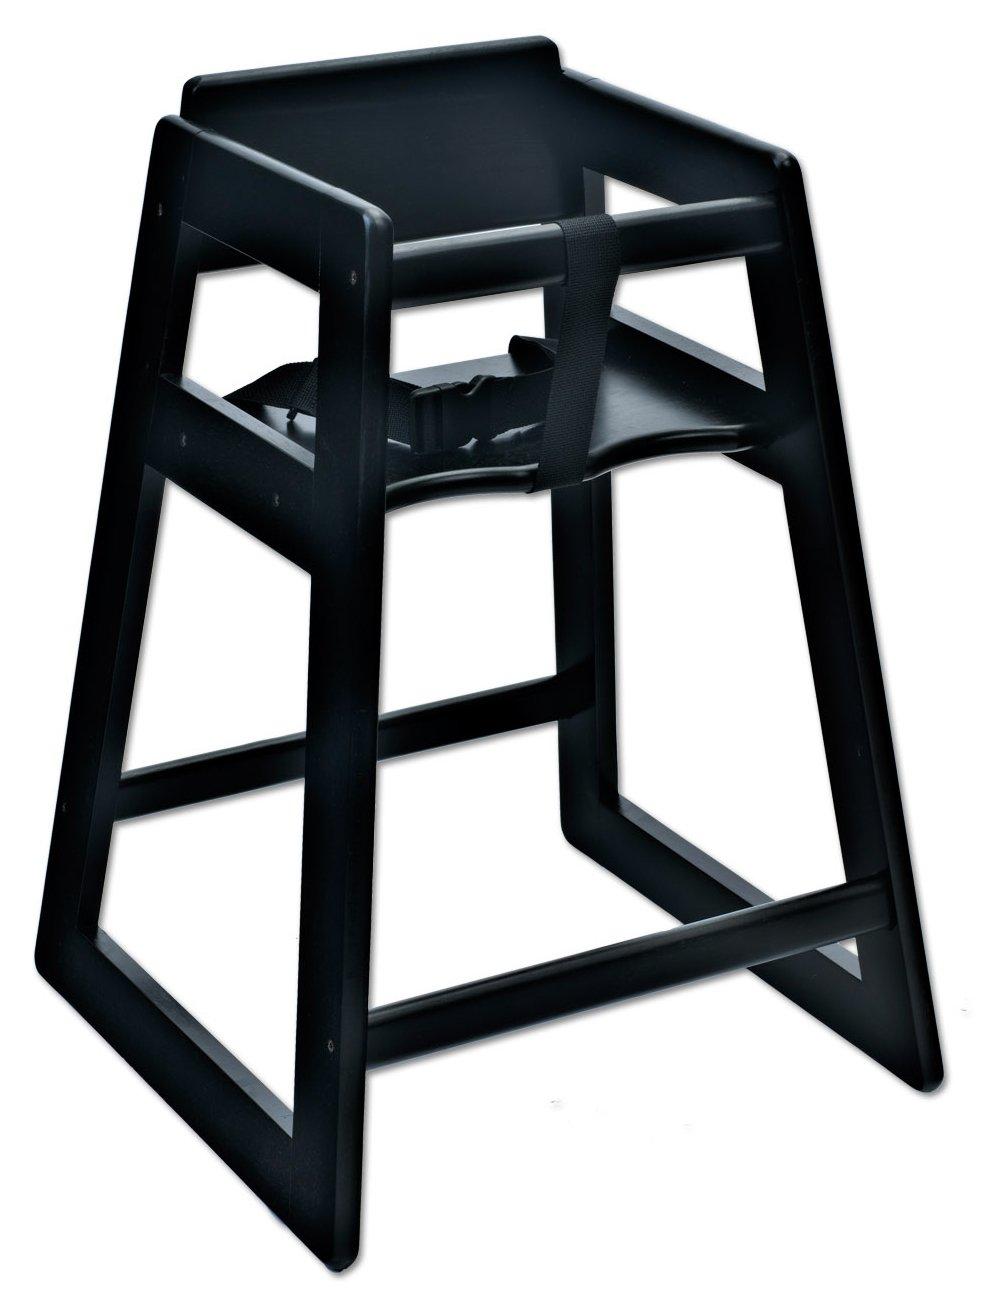 Koala Kare KB800-22 Deluxe Wood High Chair, black , 21'' Height, 20'' width, 29'' Length